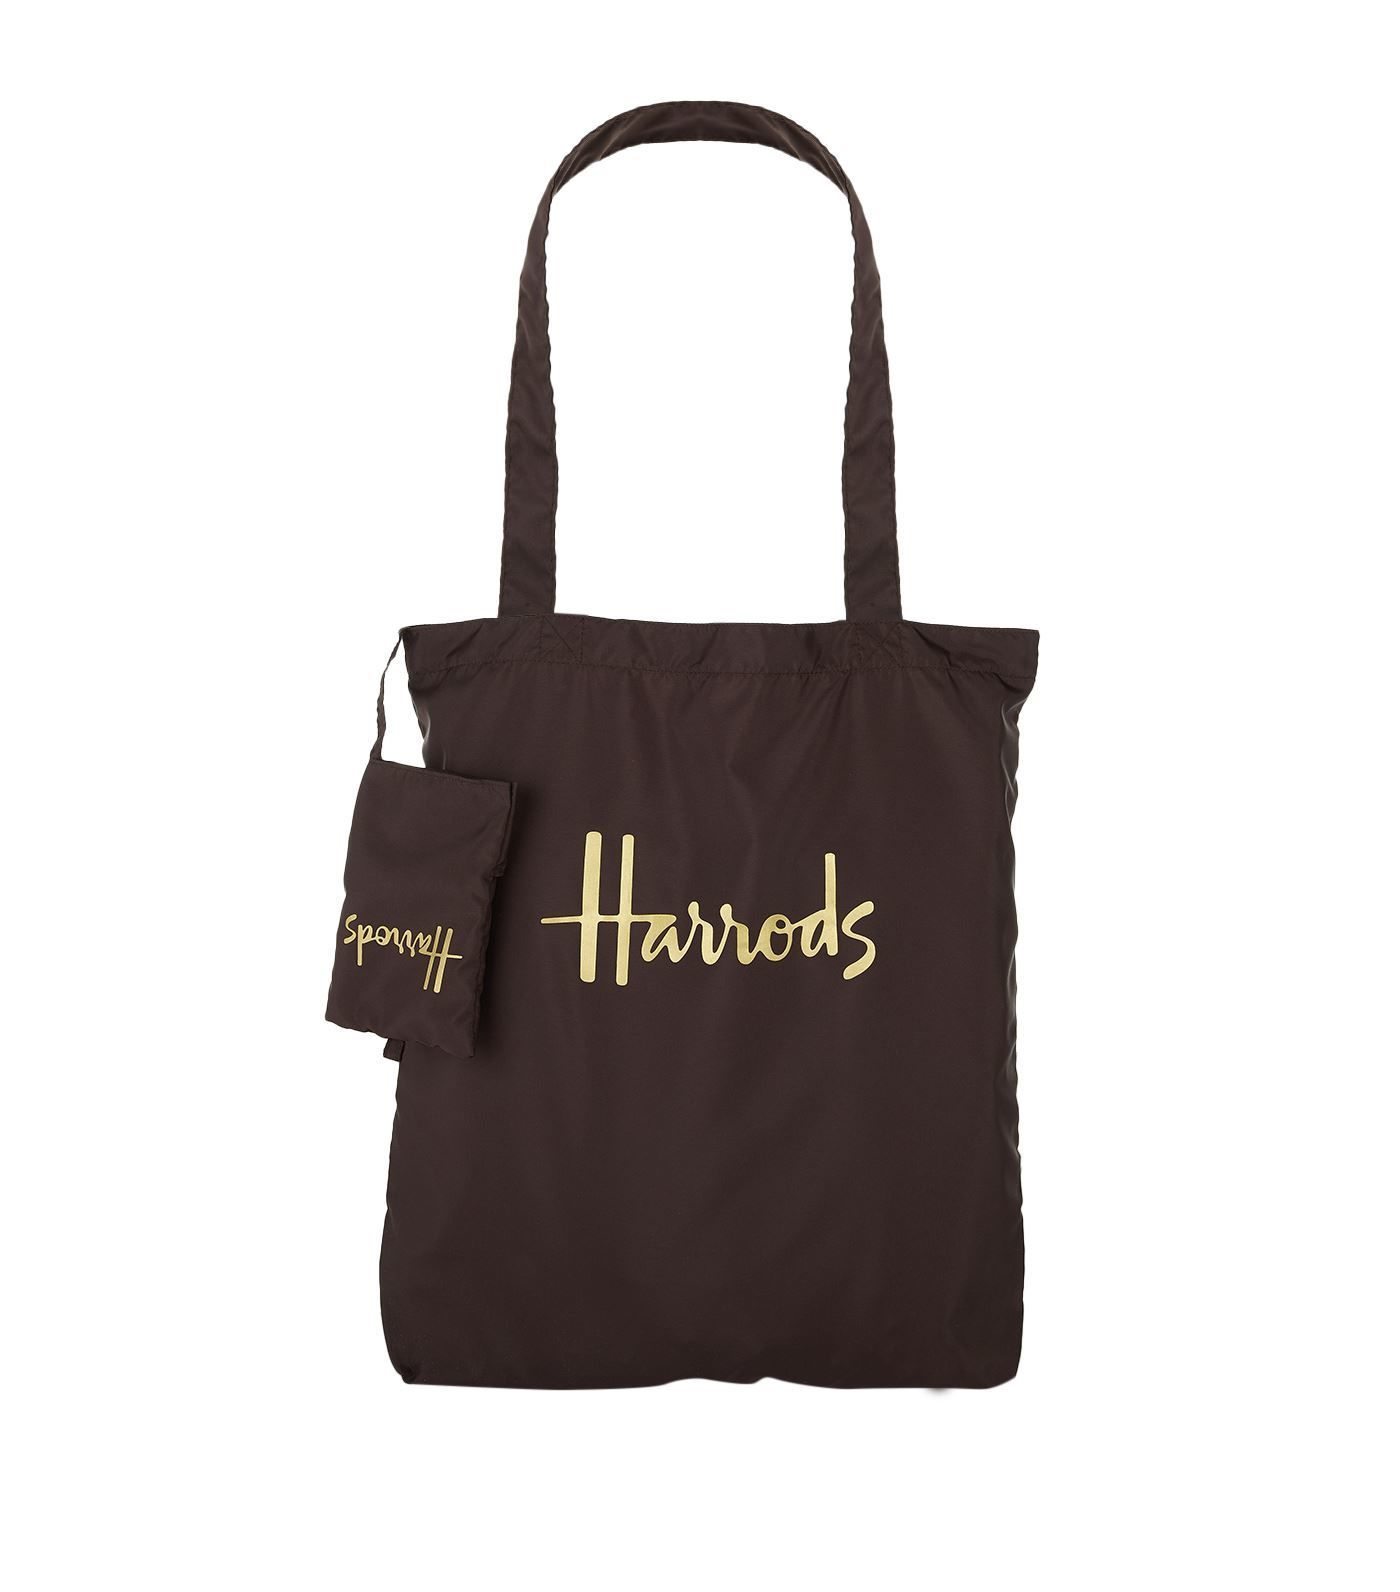 [Harrods] ハロッズ エコバッグ / 折りたたみ 収納袋付 ポケットショッピングバッグ